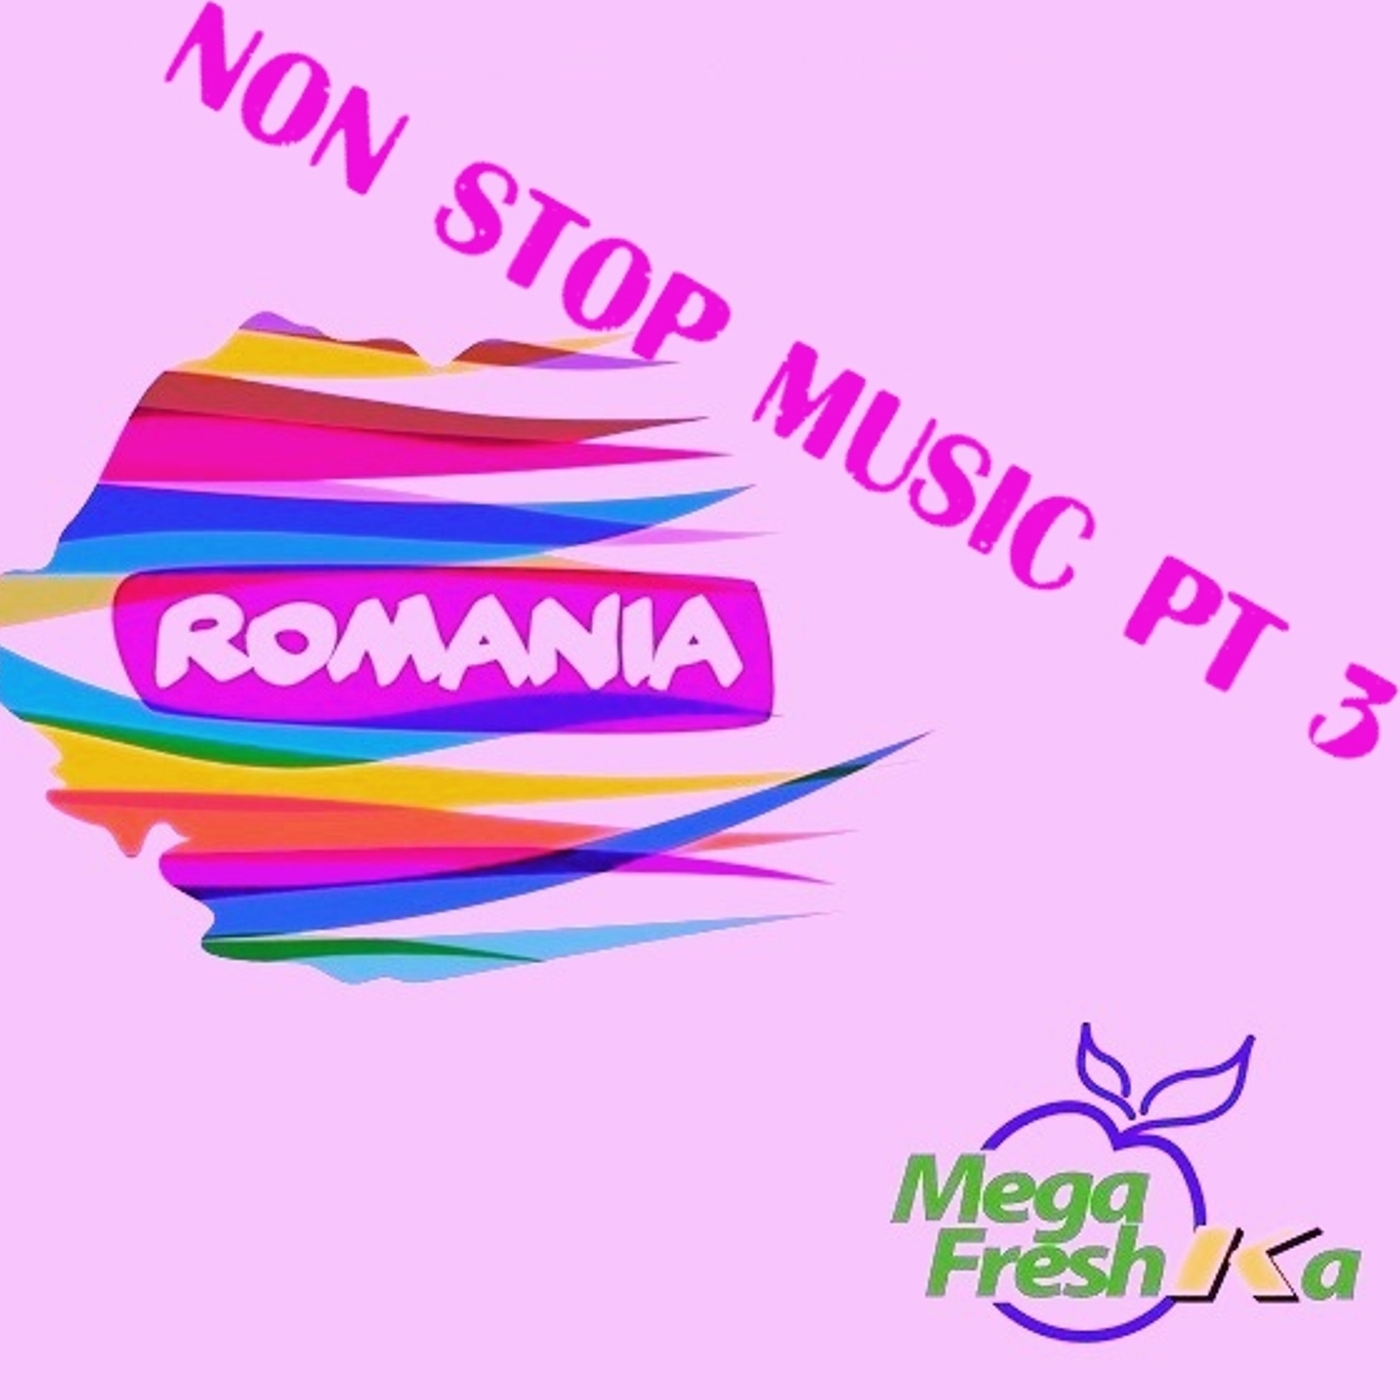 Romania Non Stop Music Megafreshka Pt 3